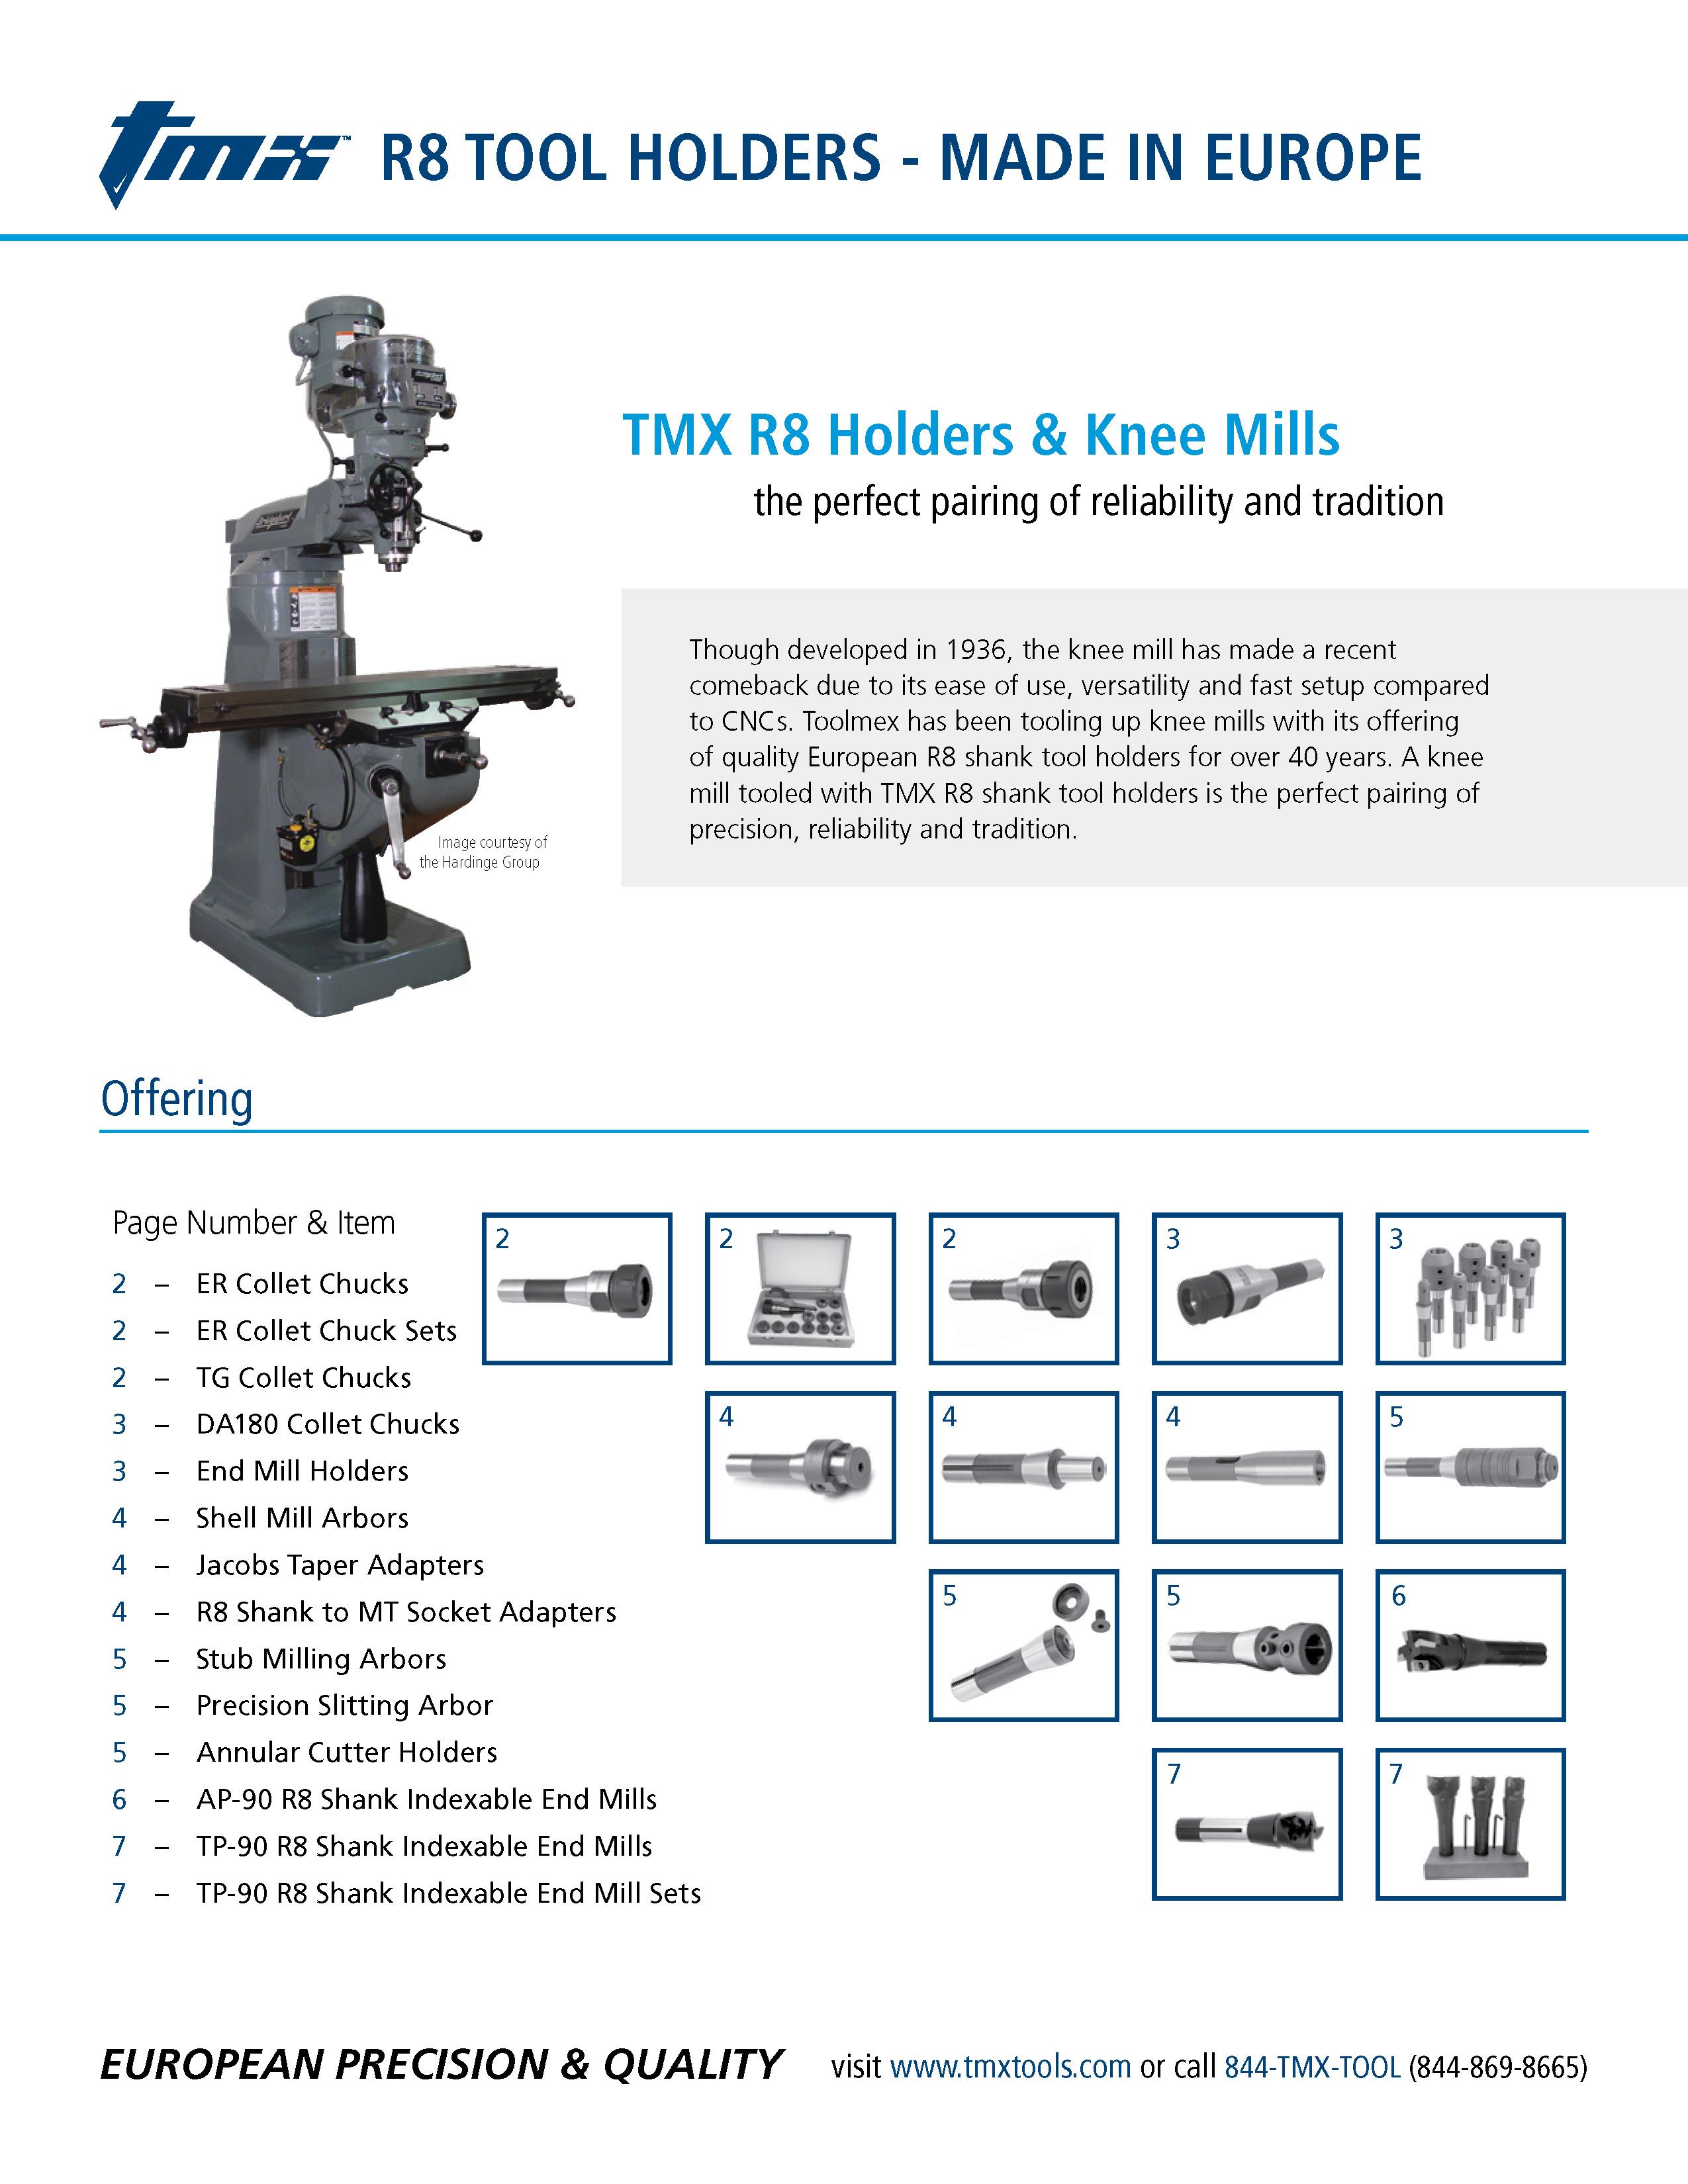 Download Literature Toolmex Industrial Solutions Trigon Wiring Diagram Tmx R8 Rotary Tool Holders